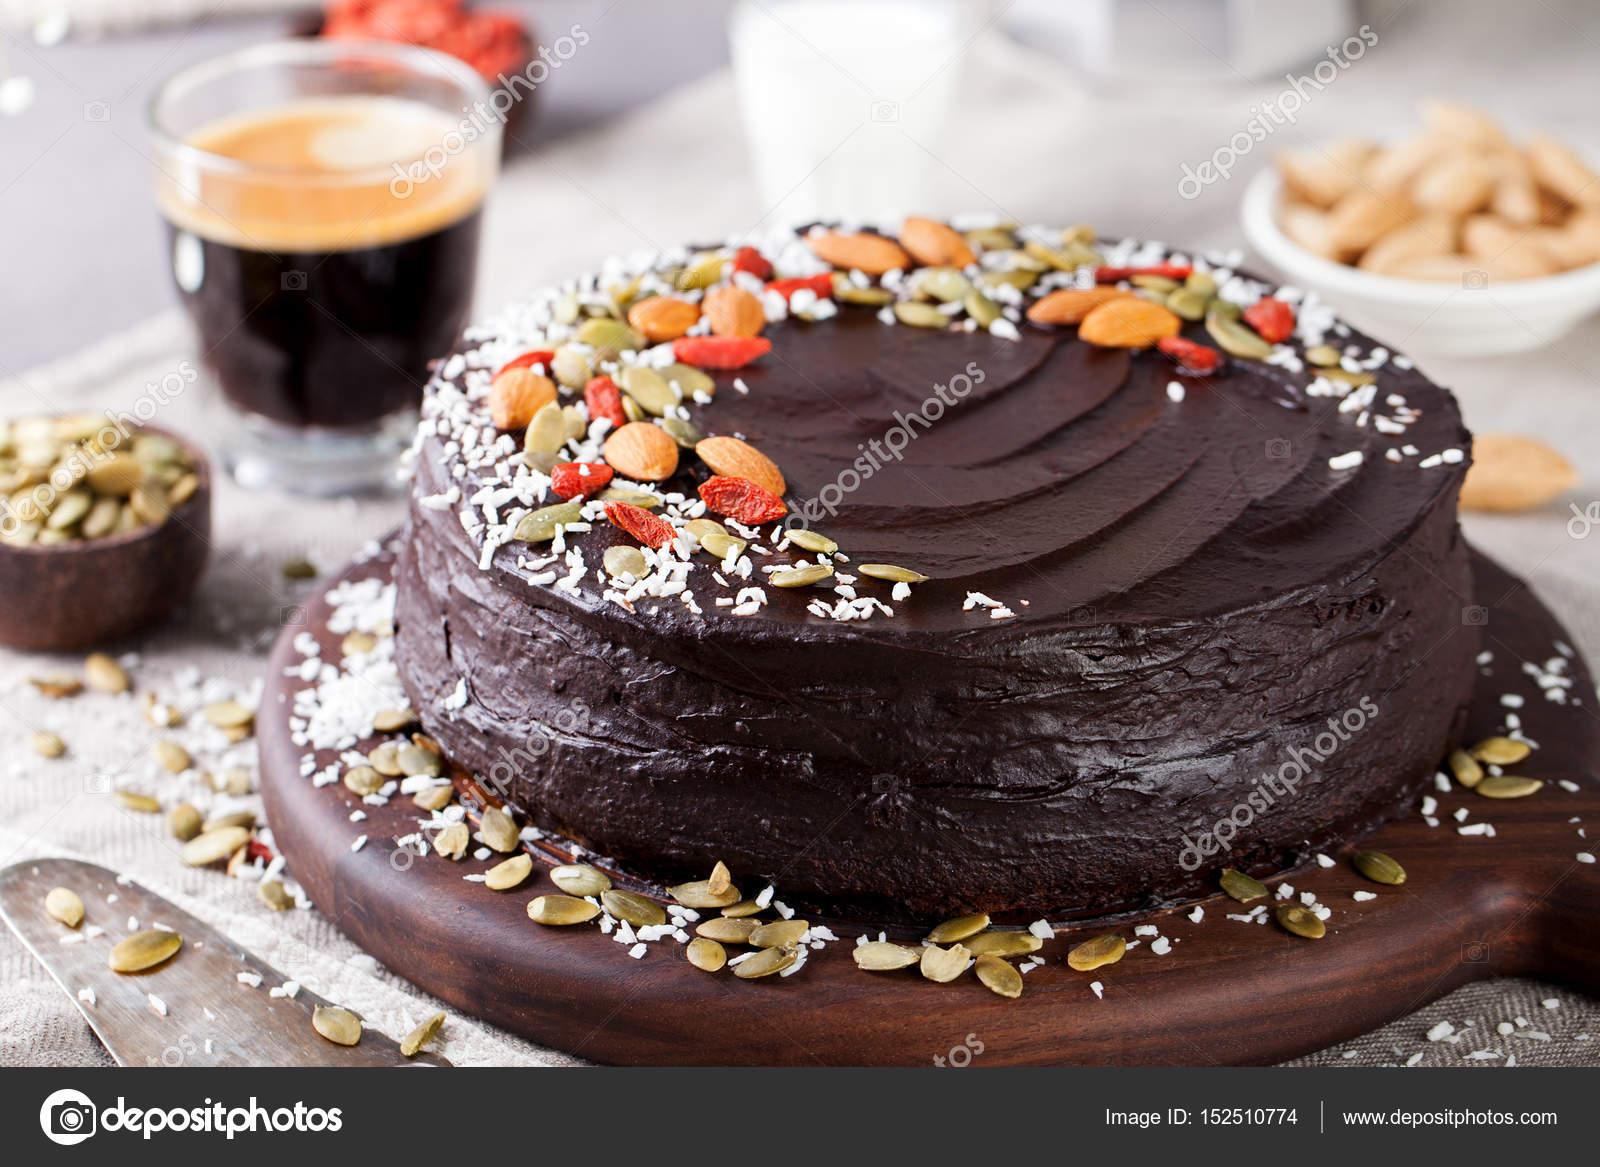 Vegane Schokolade Rüben Kuchen mit Avocado Zuckerguss — Stockfoto ...